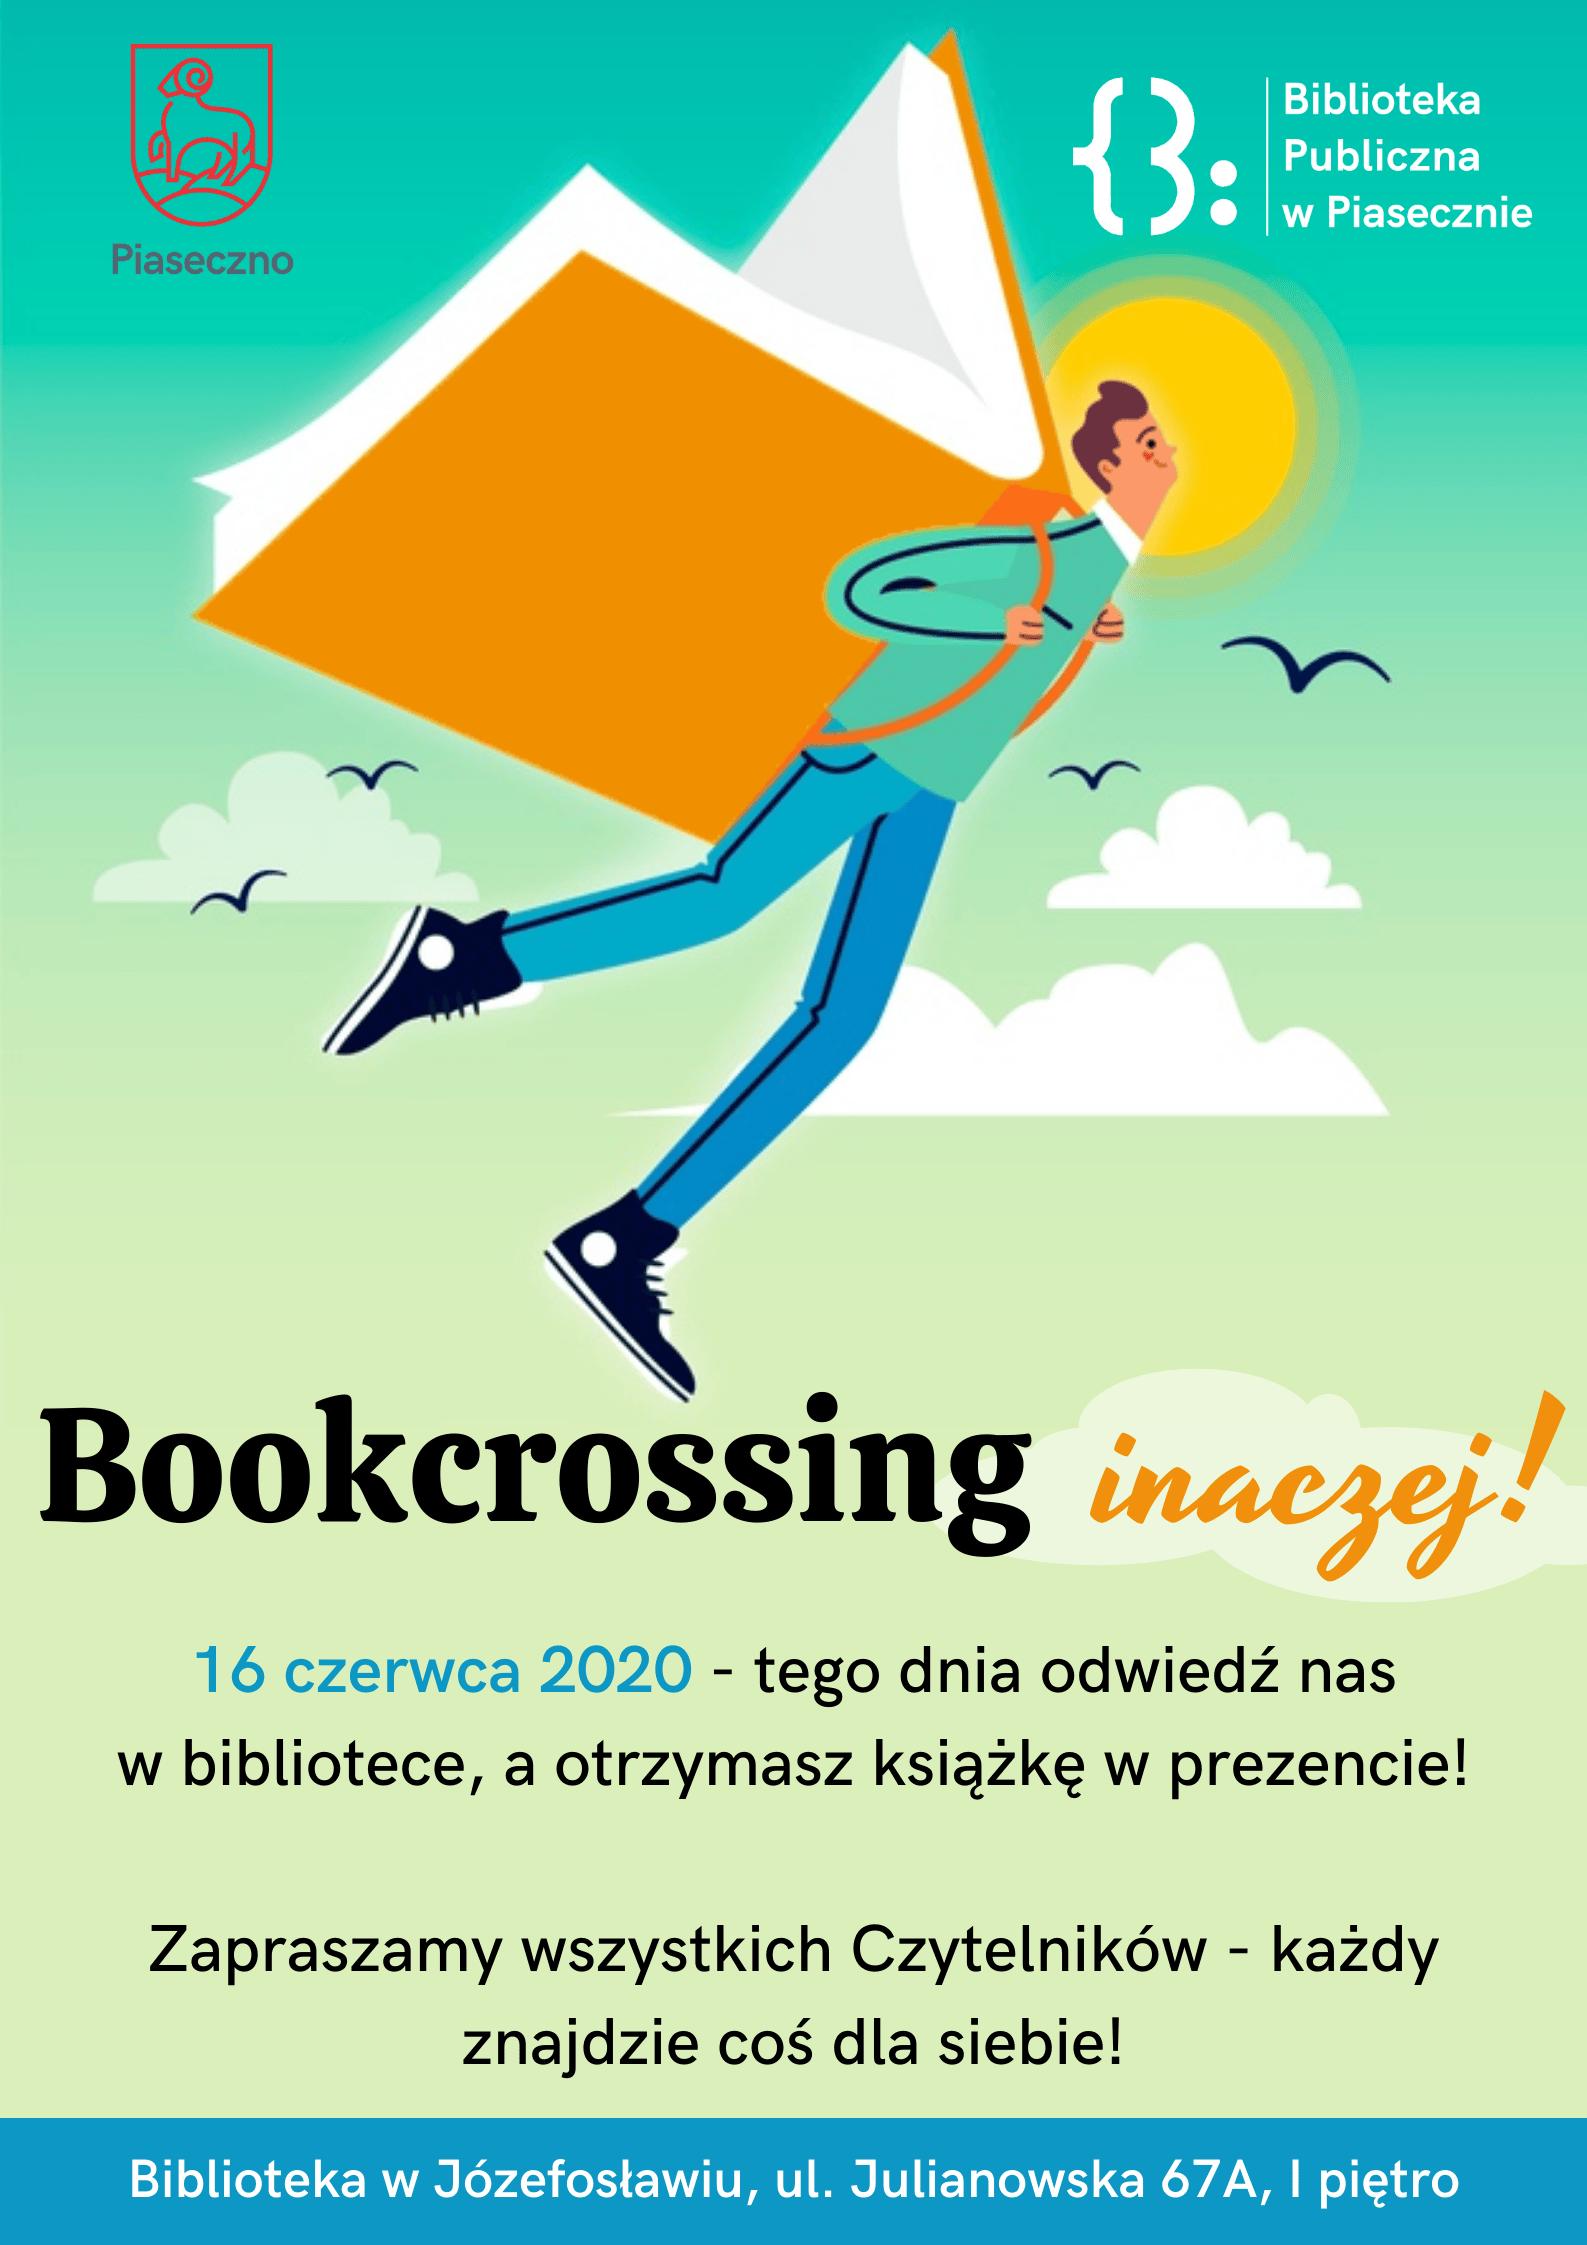 Bookcrossing inaczej